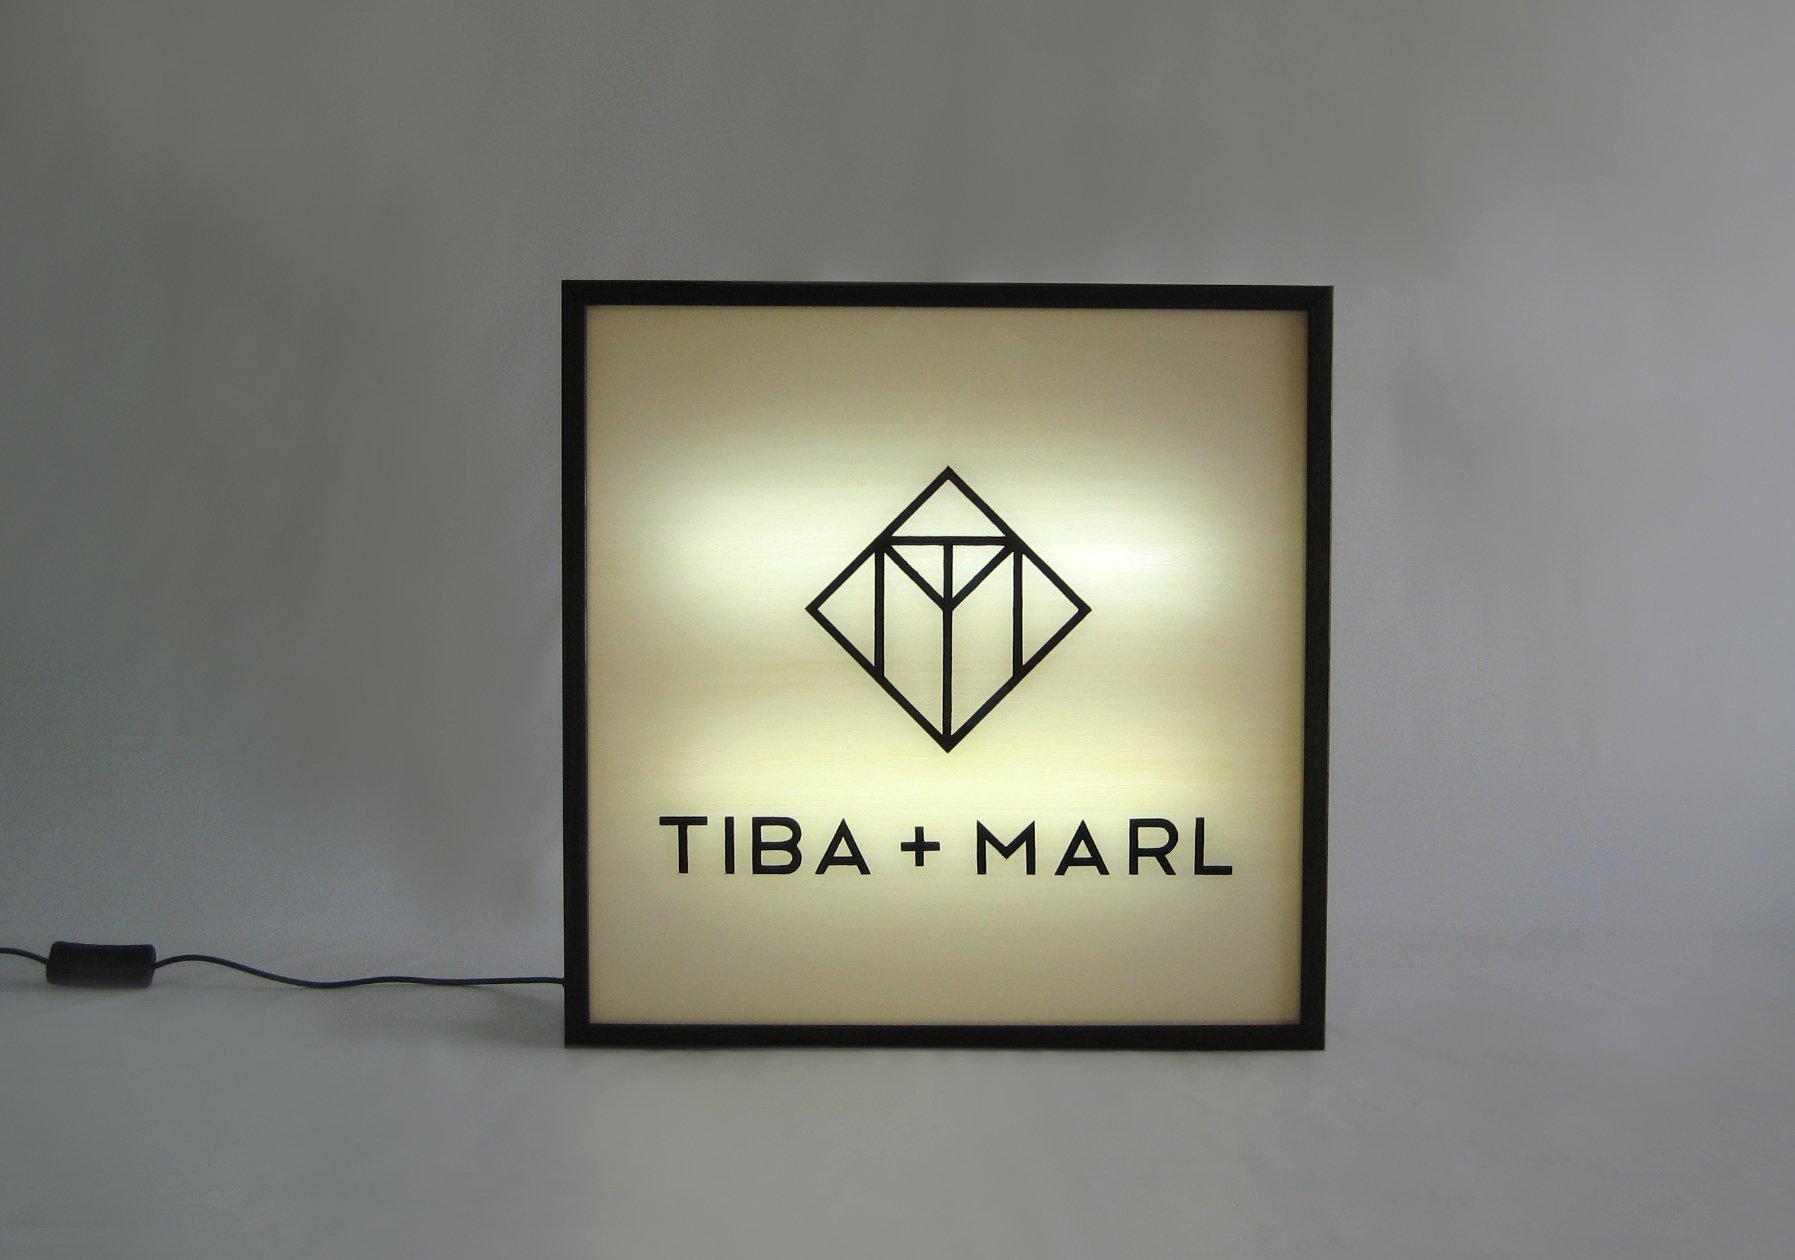 Custom Made Hand Painted TIBA AND MARL logo lightbox sign